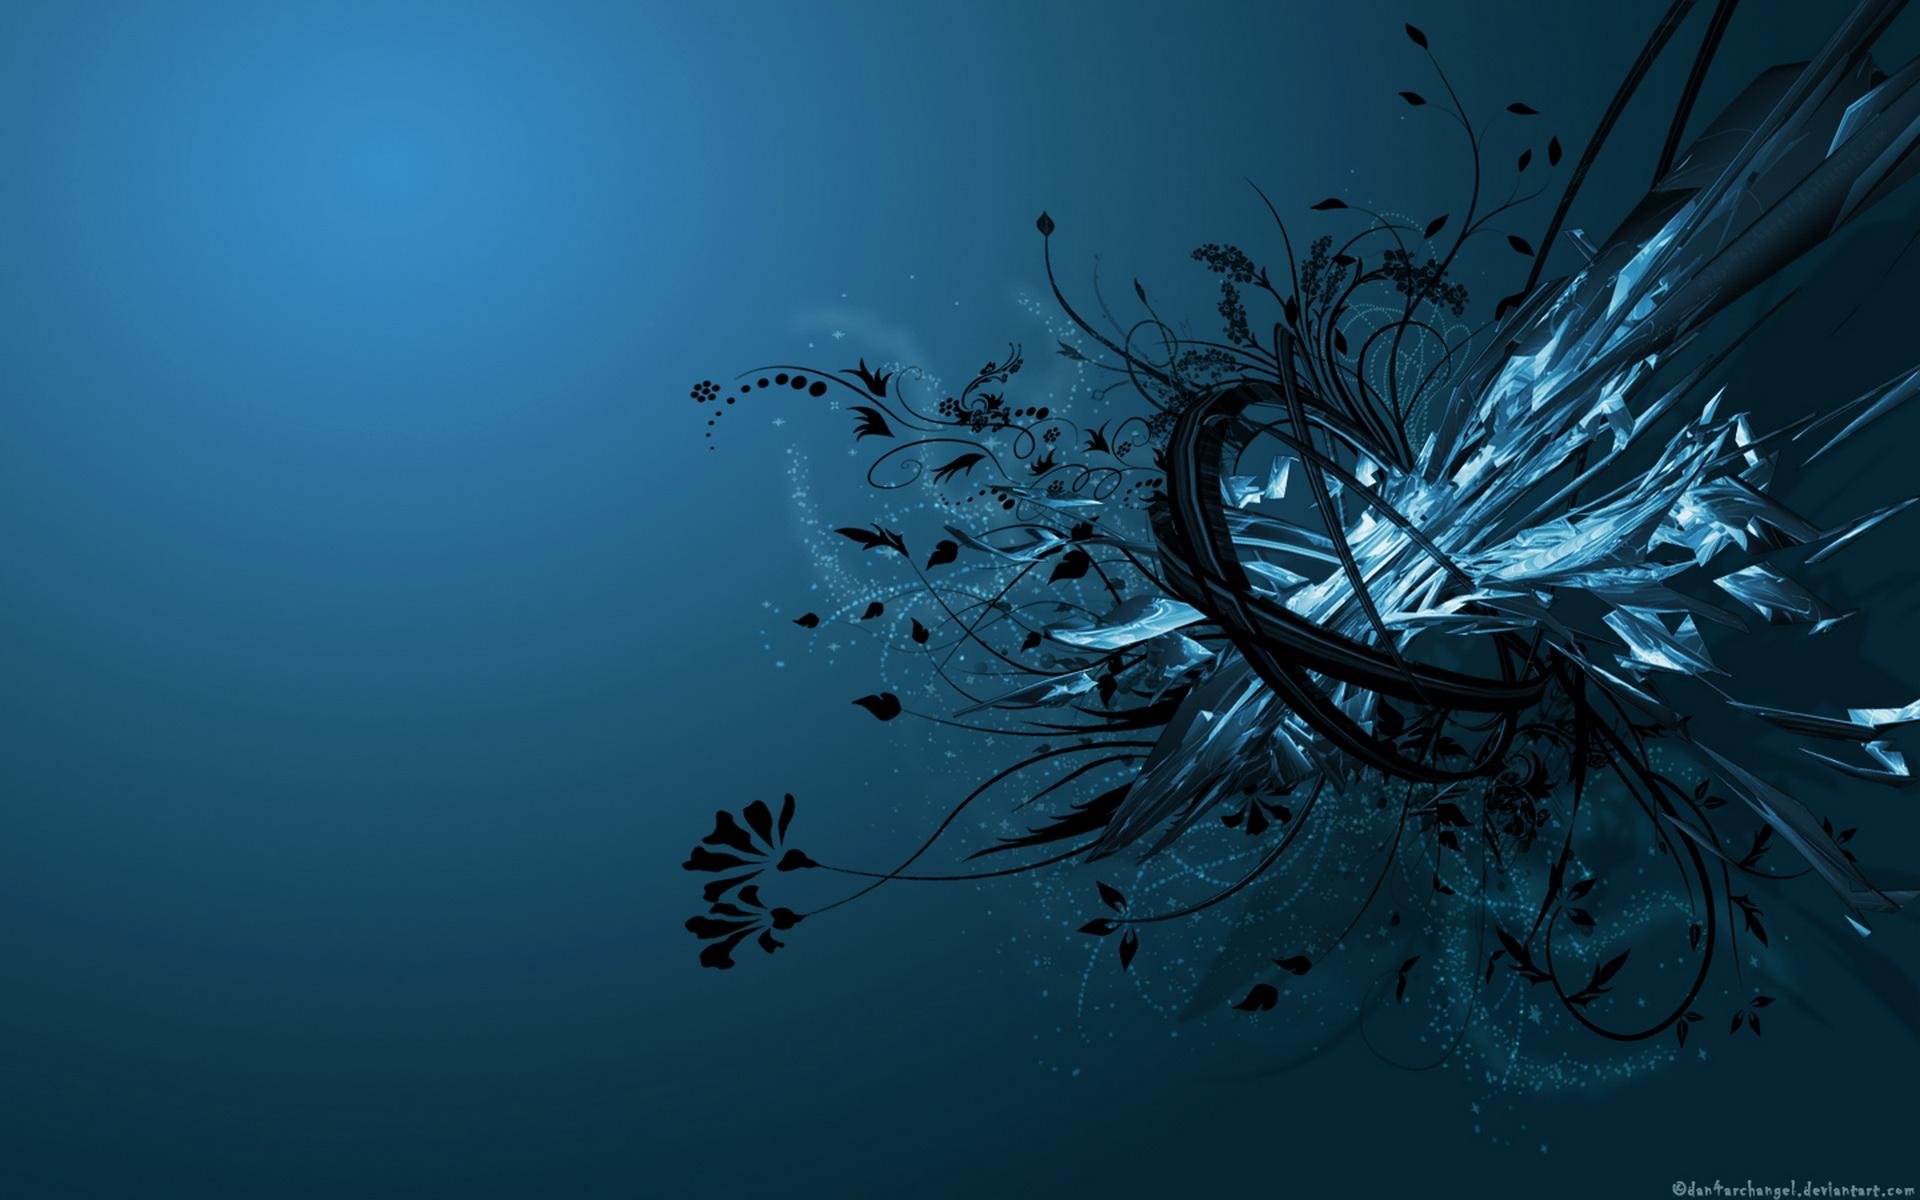 Wallpapers 'Azules' | El blog de Iyan